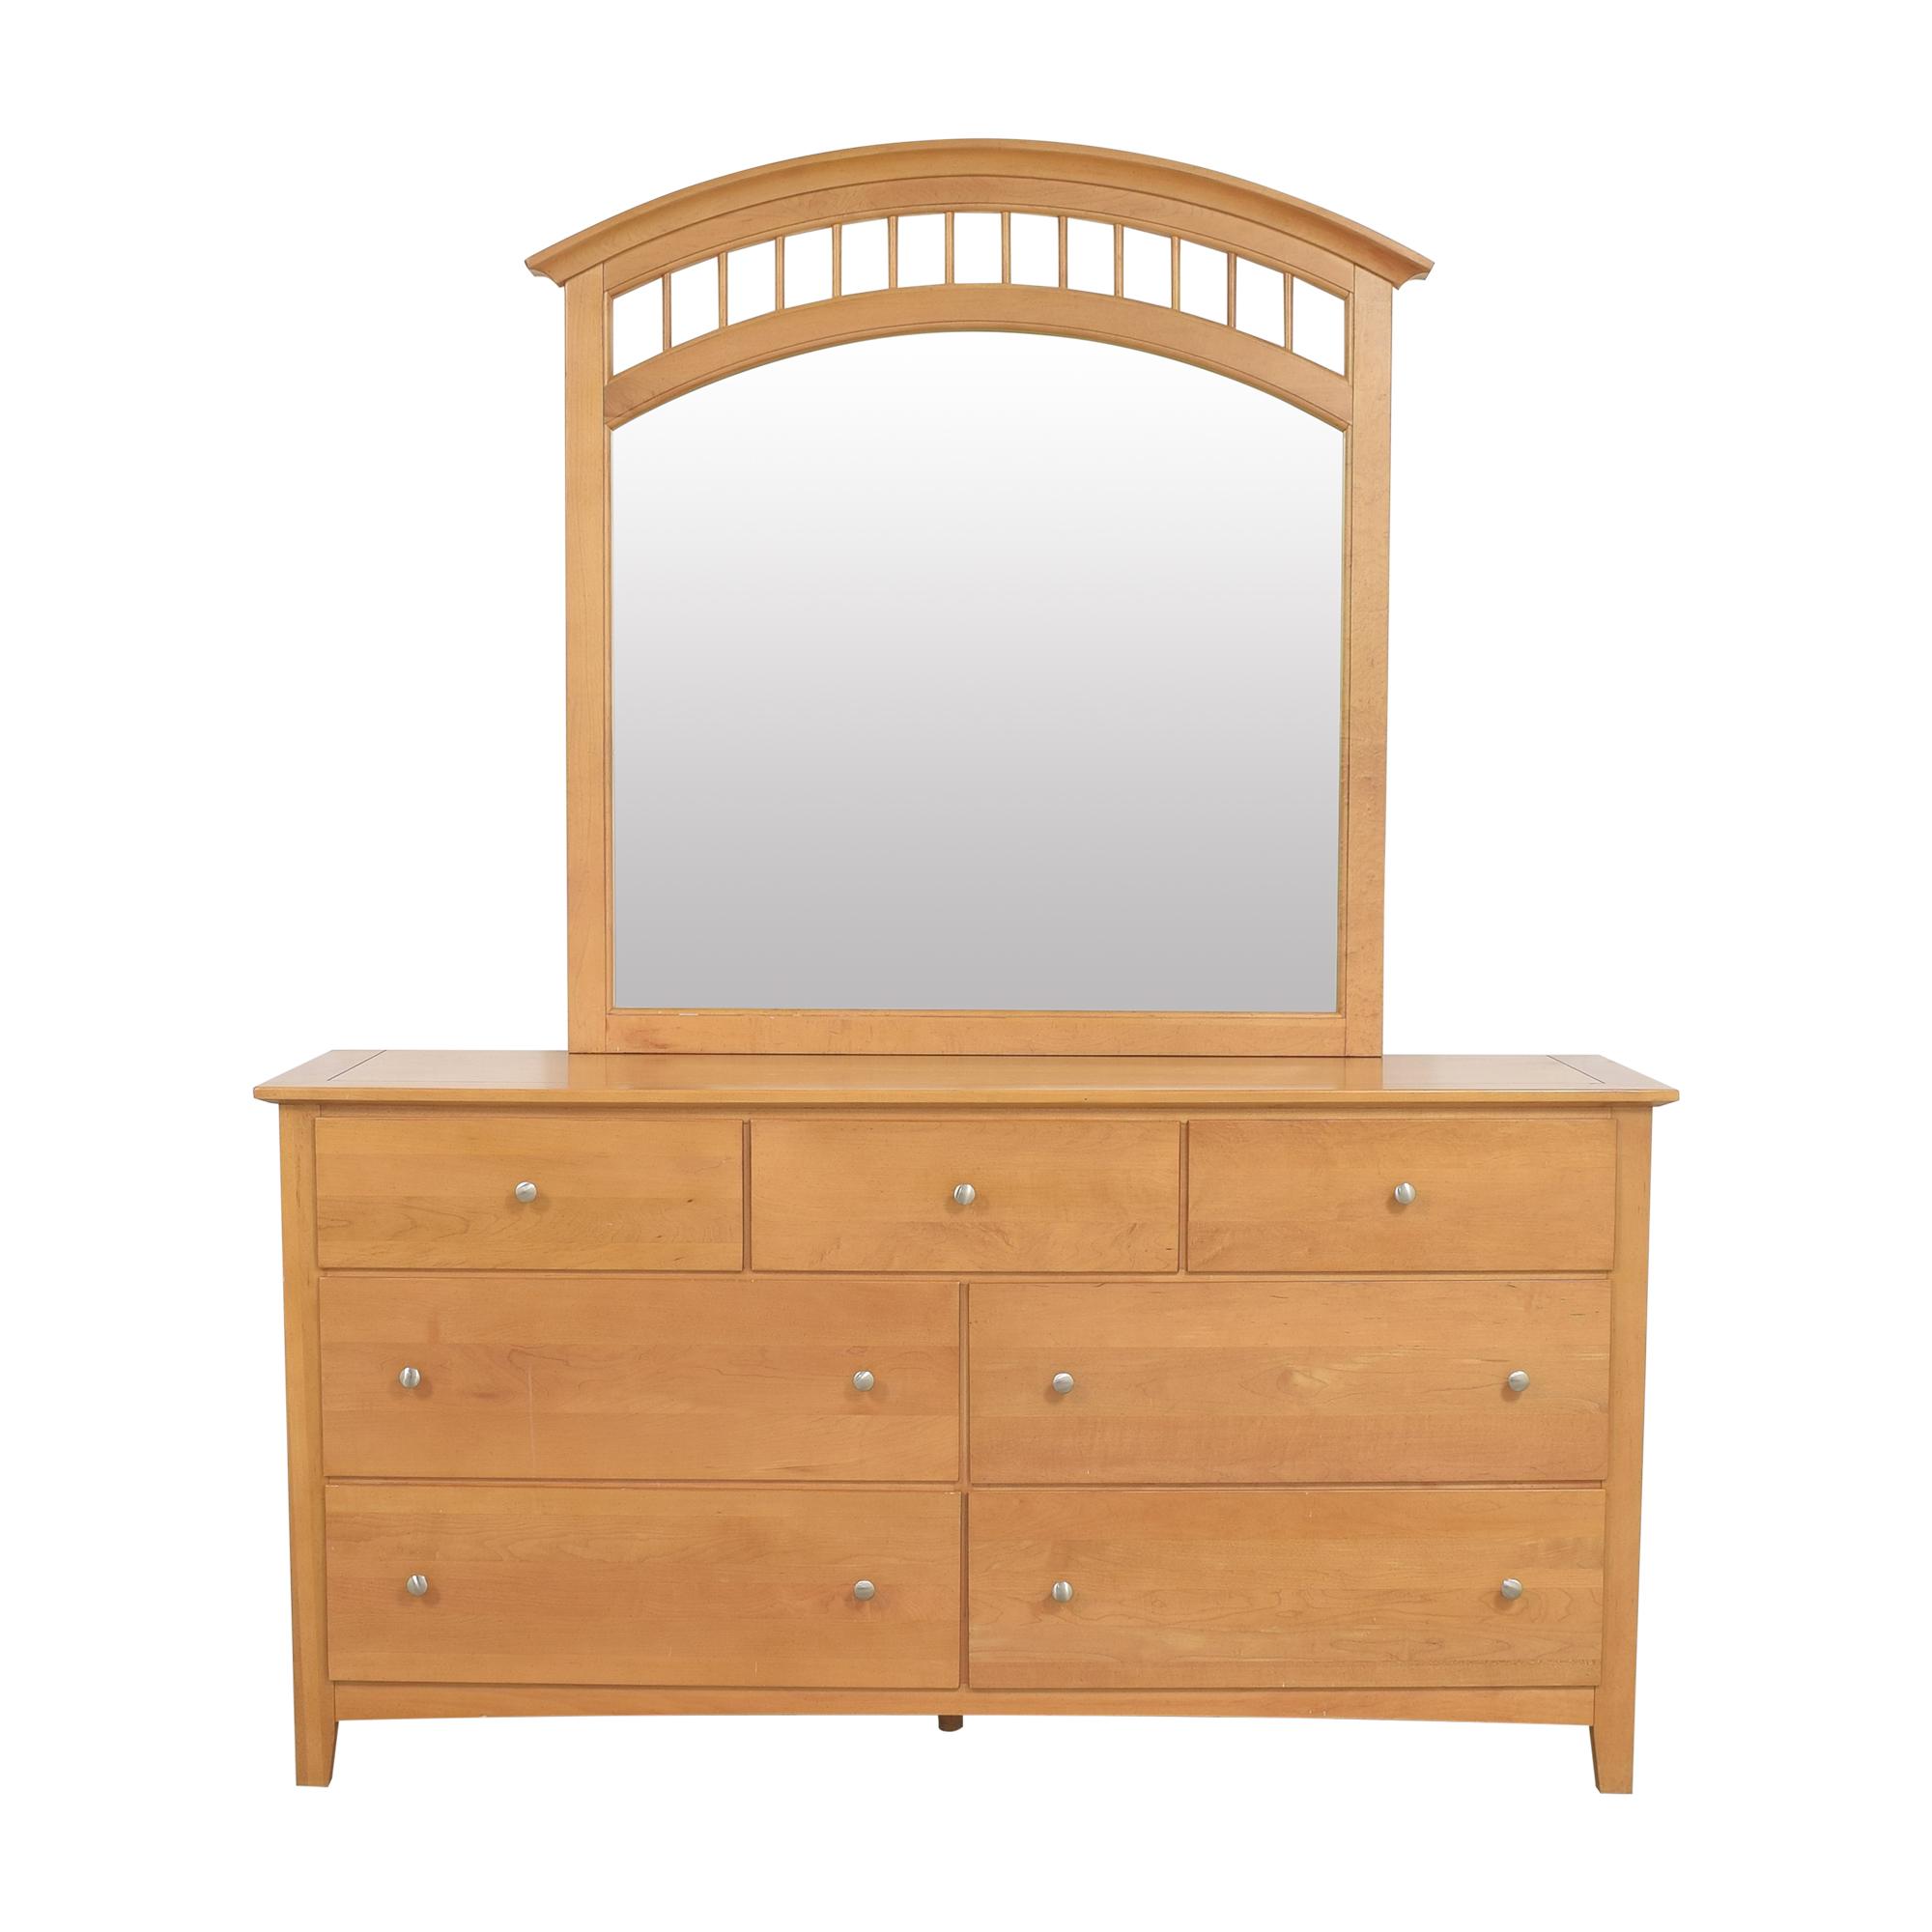 Stanley Furniture Stanley Furniture Seven Drawer Dresser with Mirror on sale